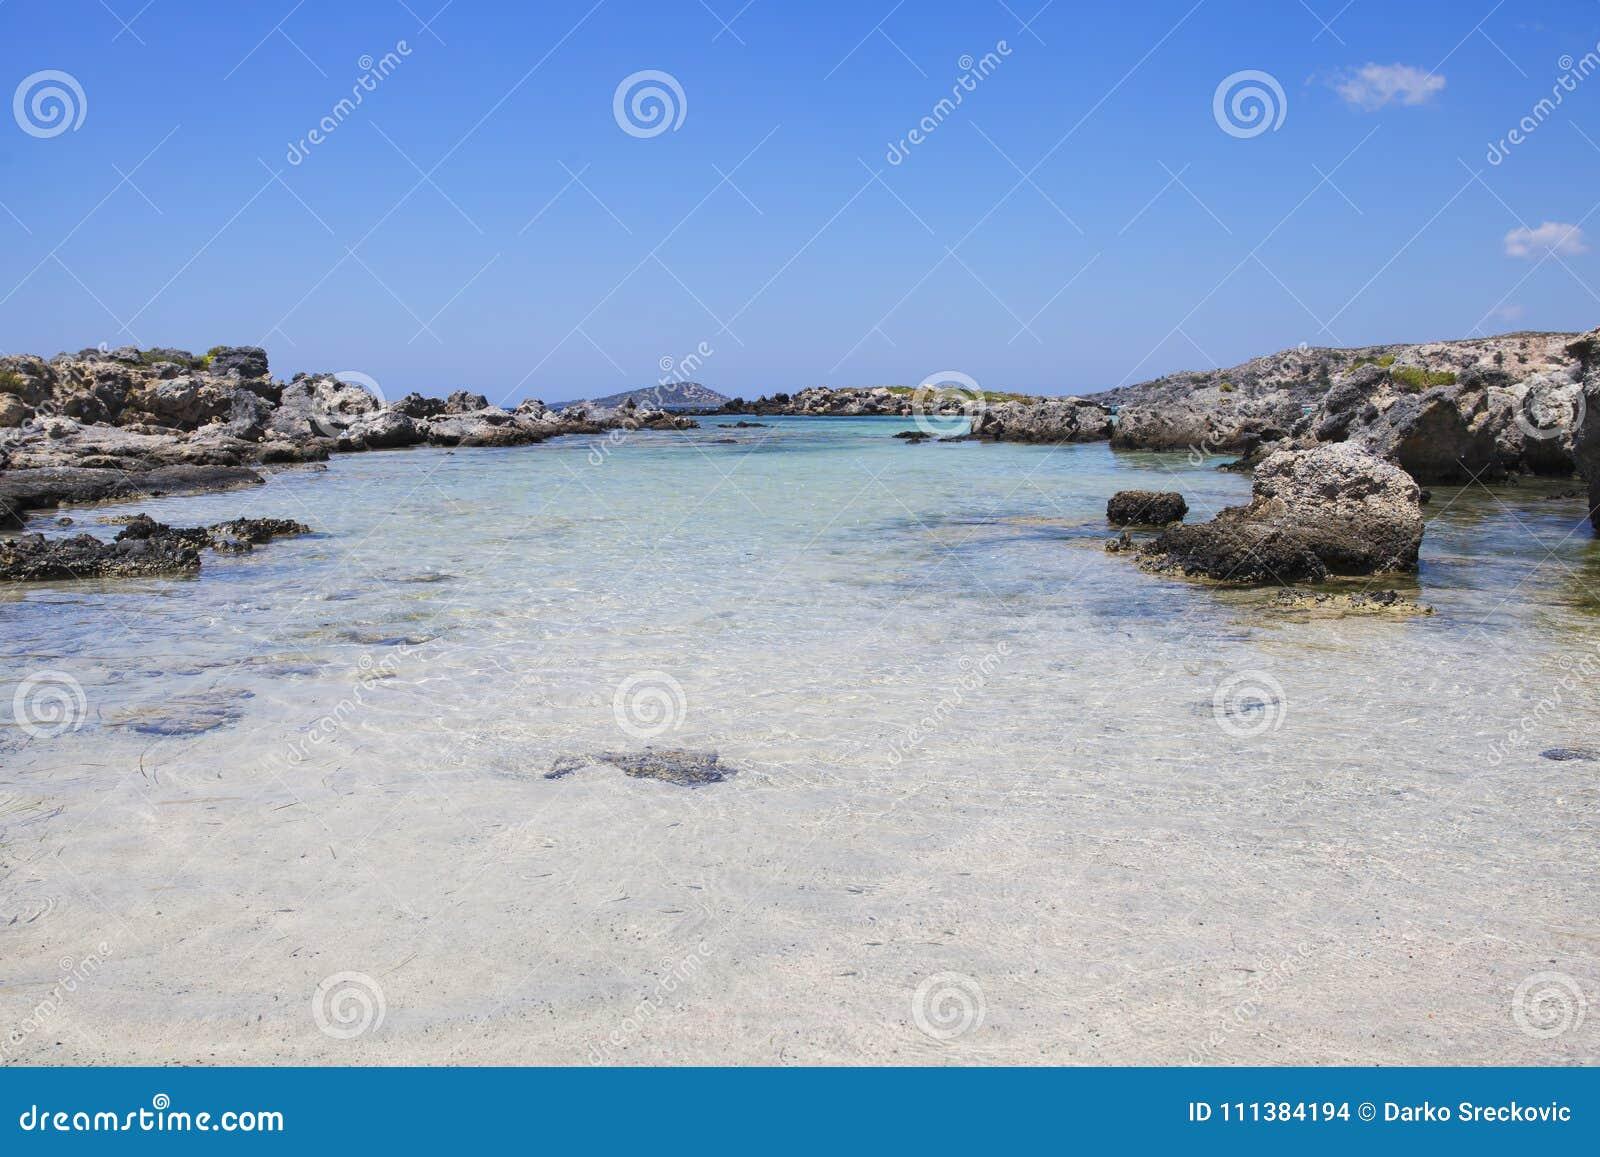 Türkiswasser An Elafonisi Strand Kreta Insel Griechenland